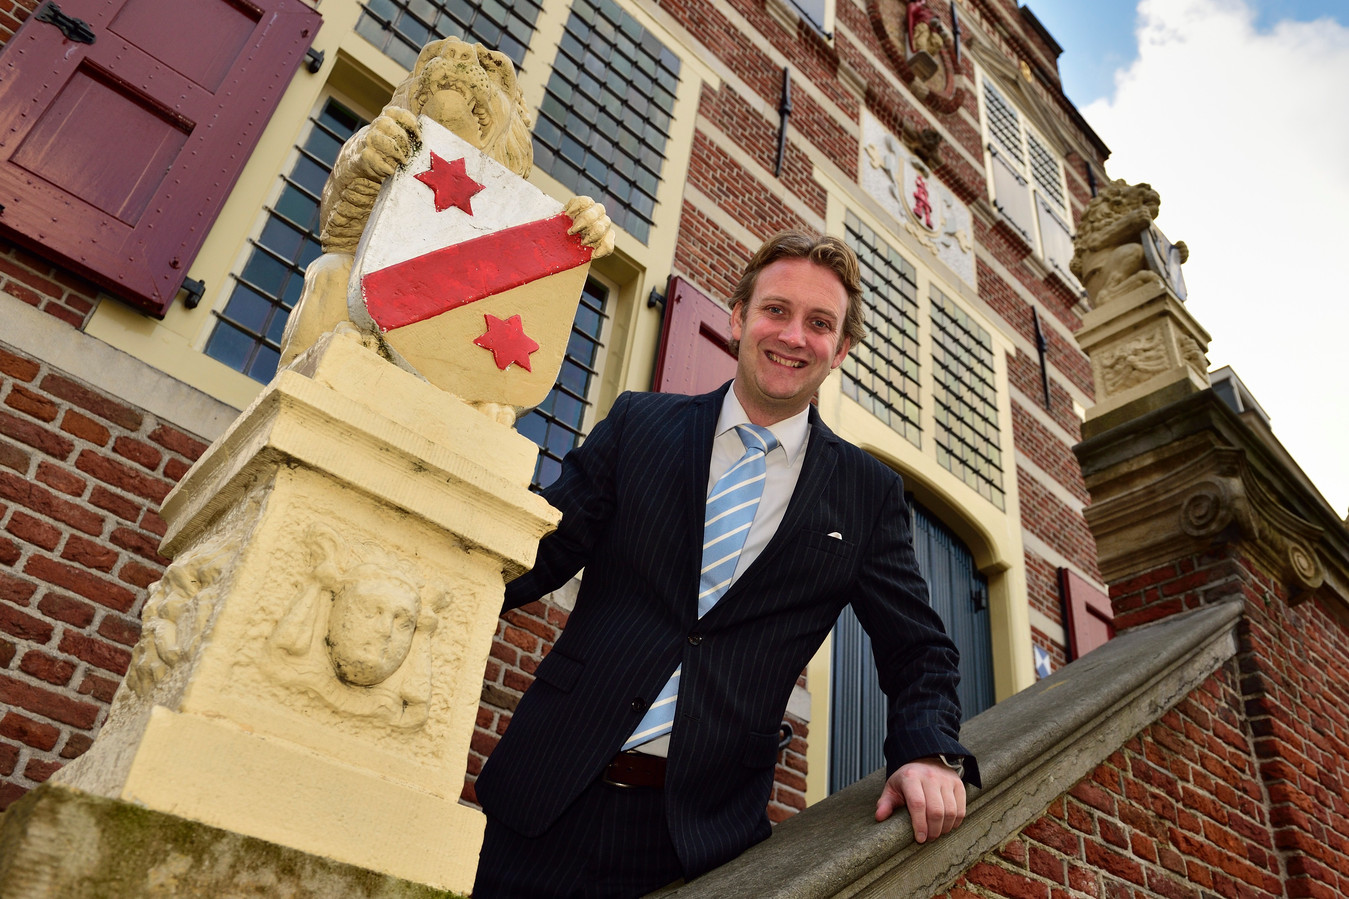 Burgemeester Oudewater Over Time Out Opeens Was Het Baf